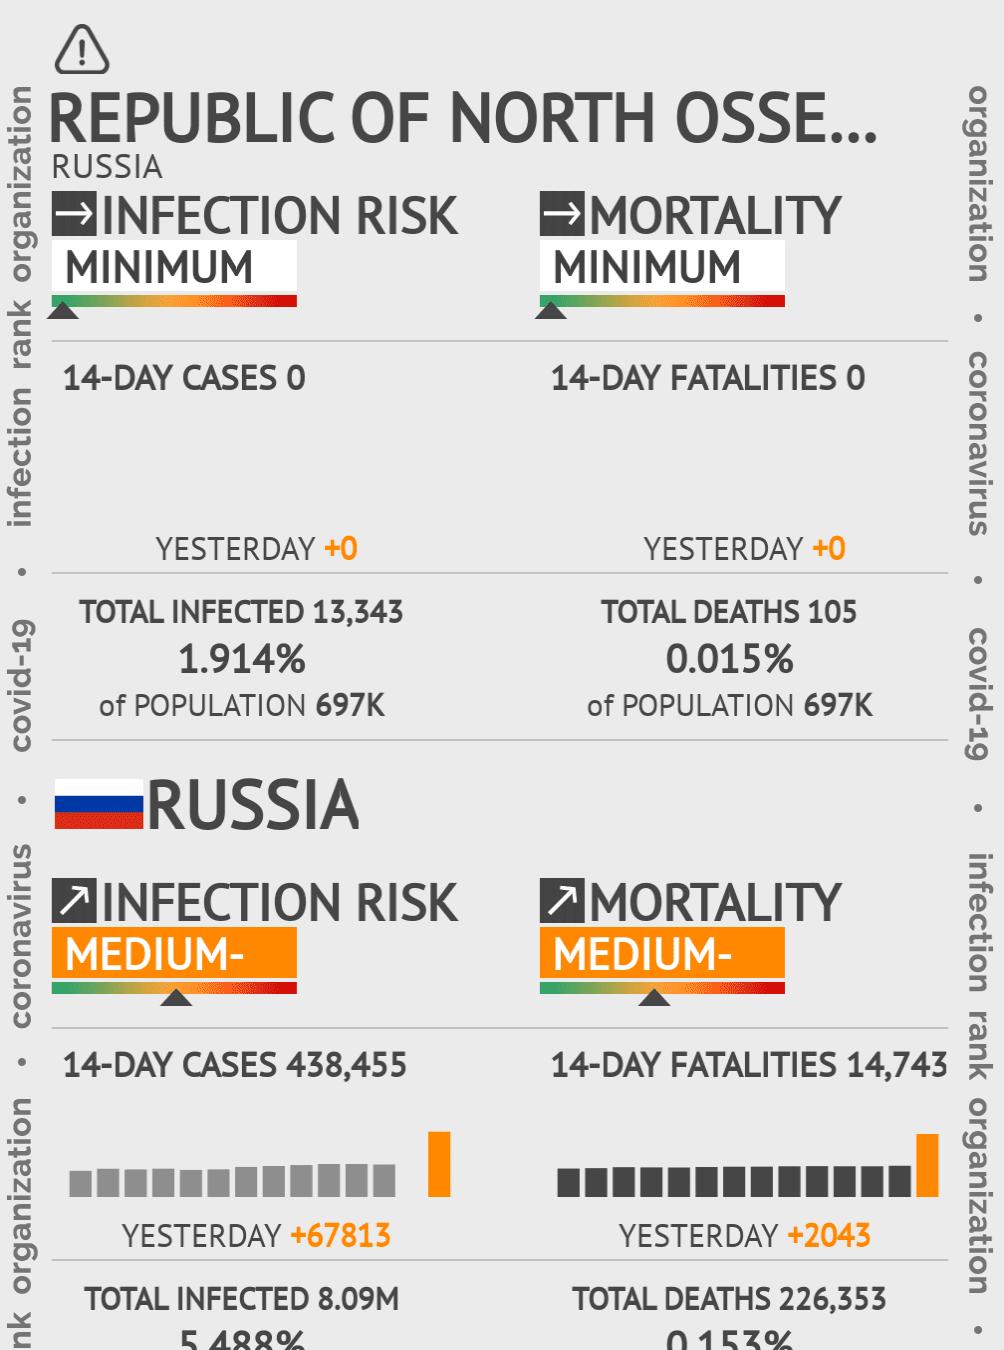 Republic of North Ossetia-Alania Coronavirus Covid-19 Risk of Infection on February 23, 2021